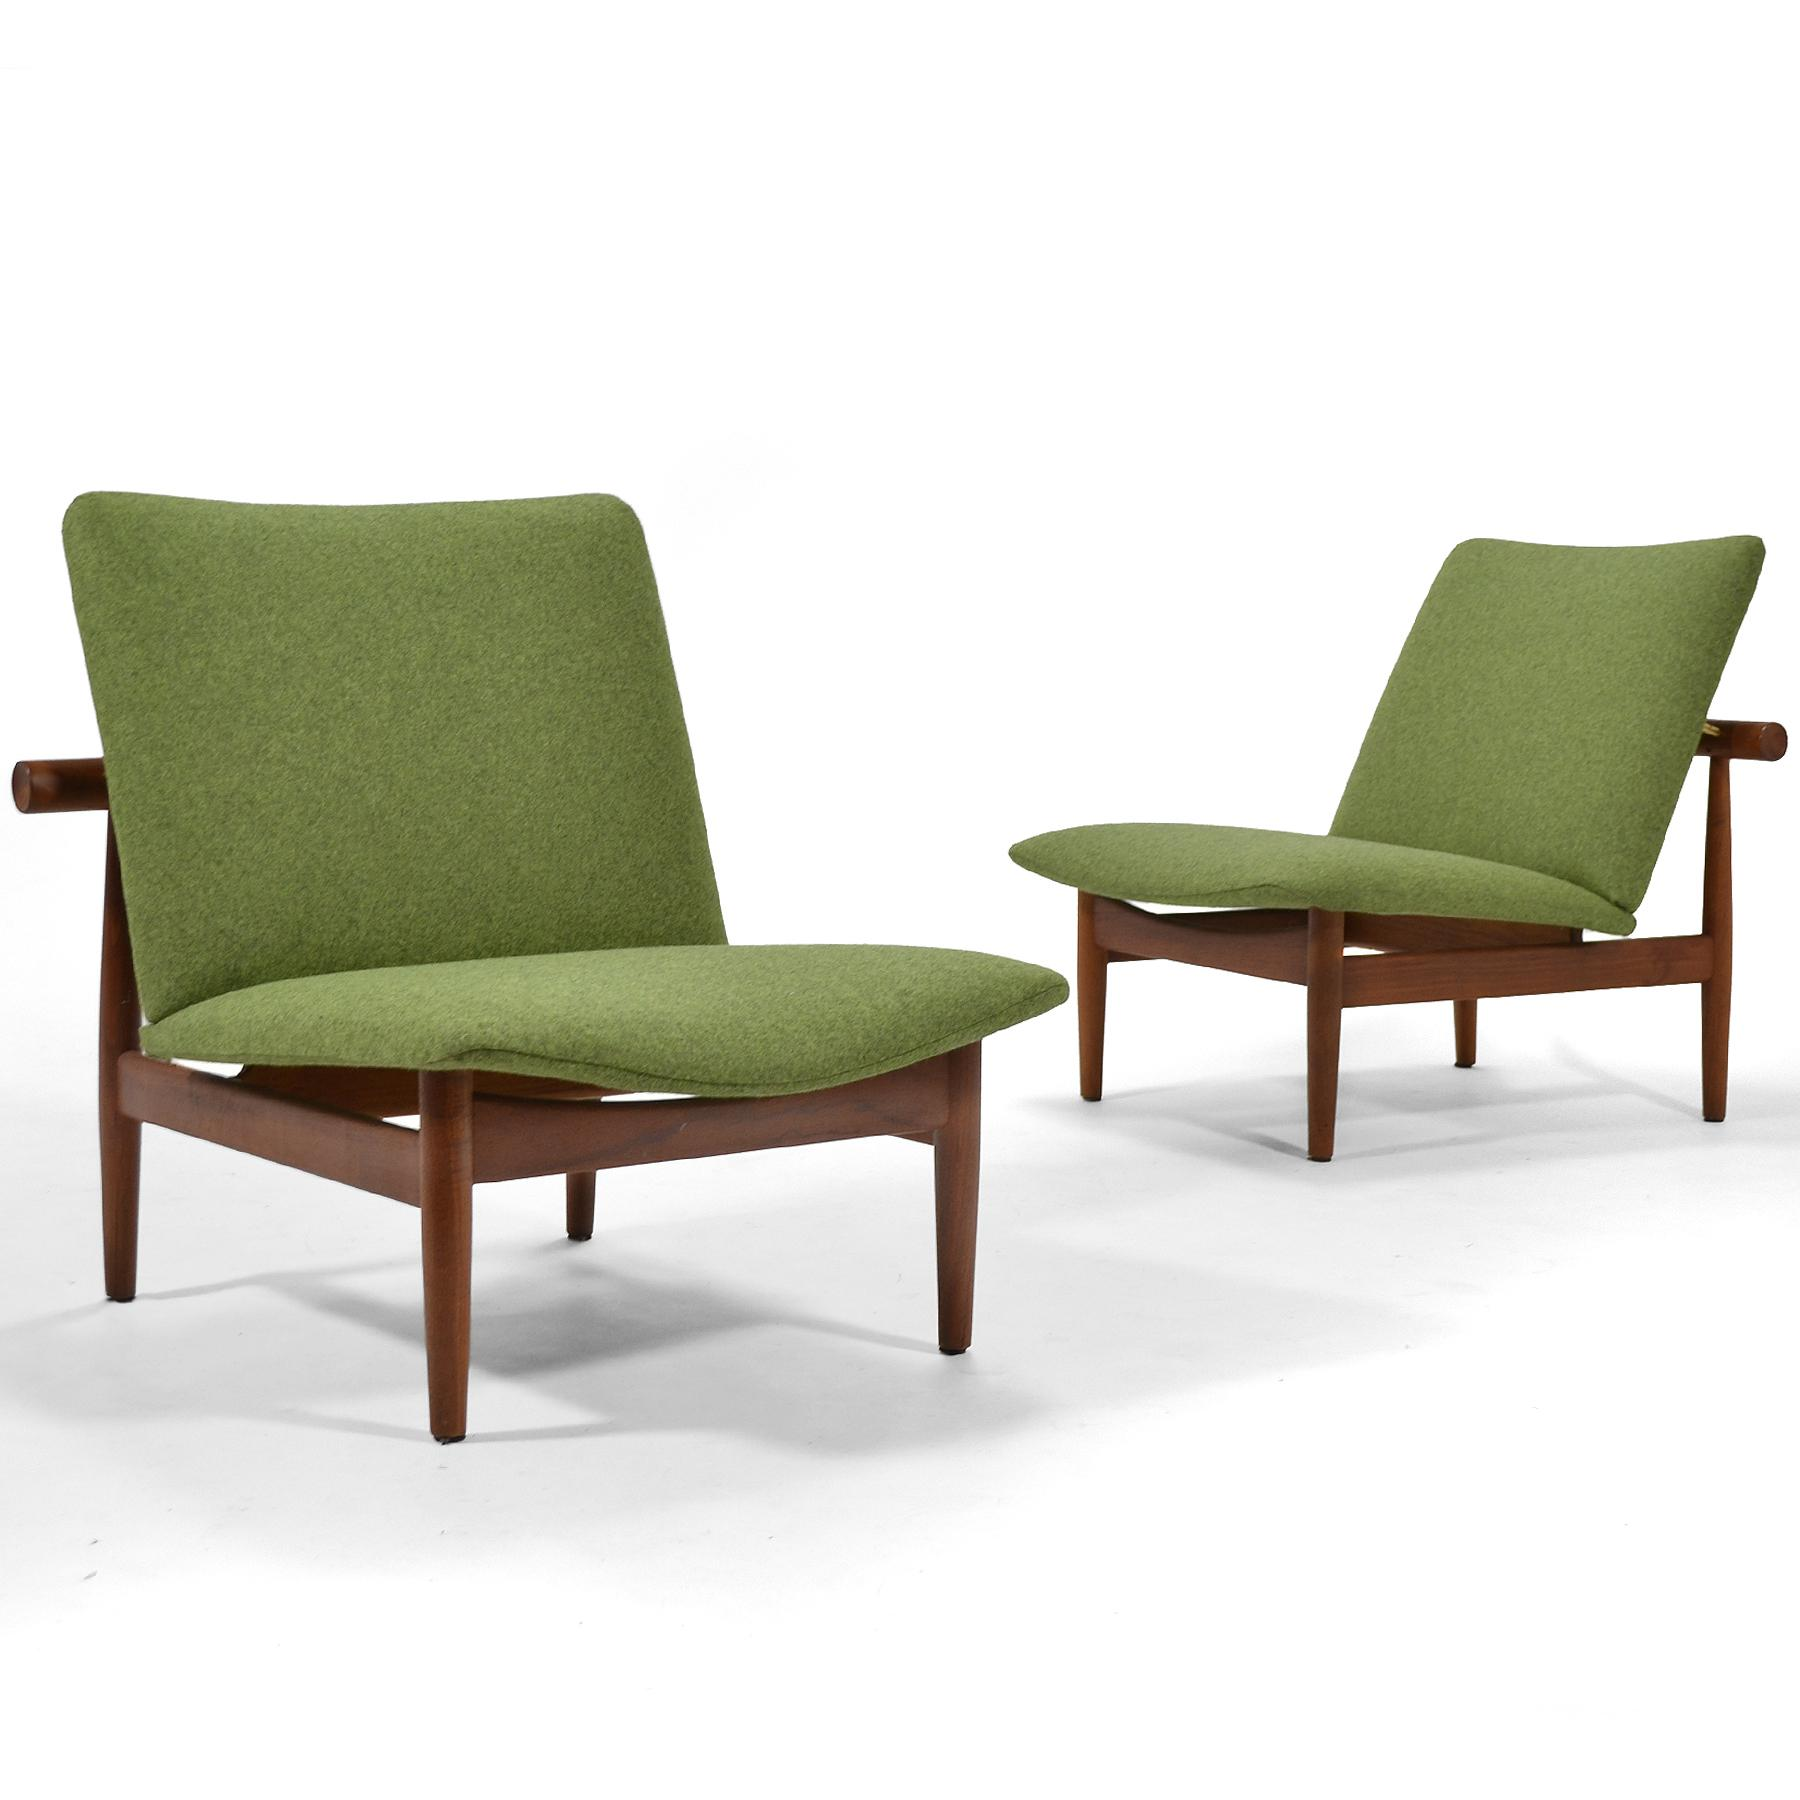 Pair Of Finn Juhl Japan Chairs By France U0026 Søn   Image 11 Of 11